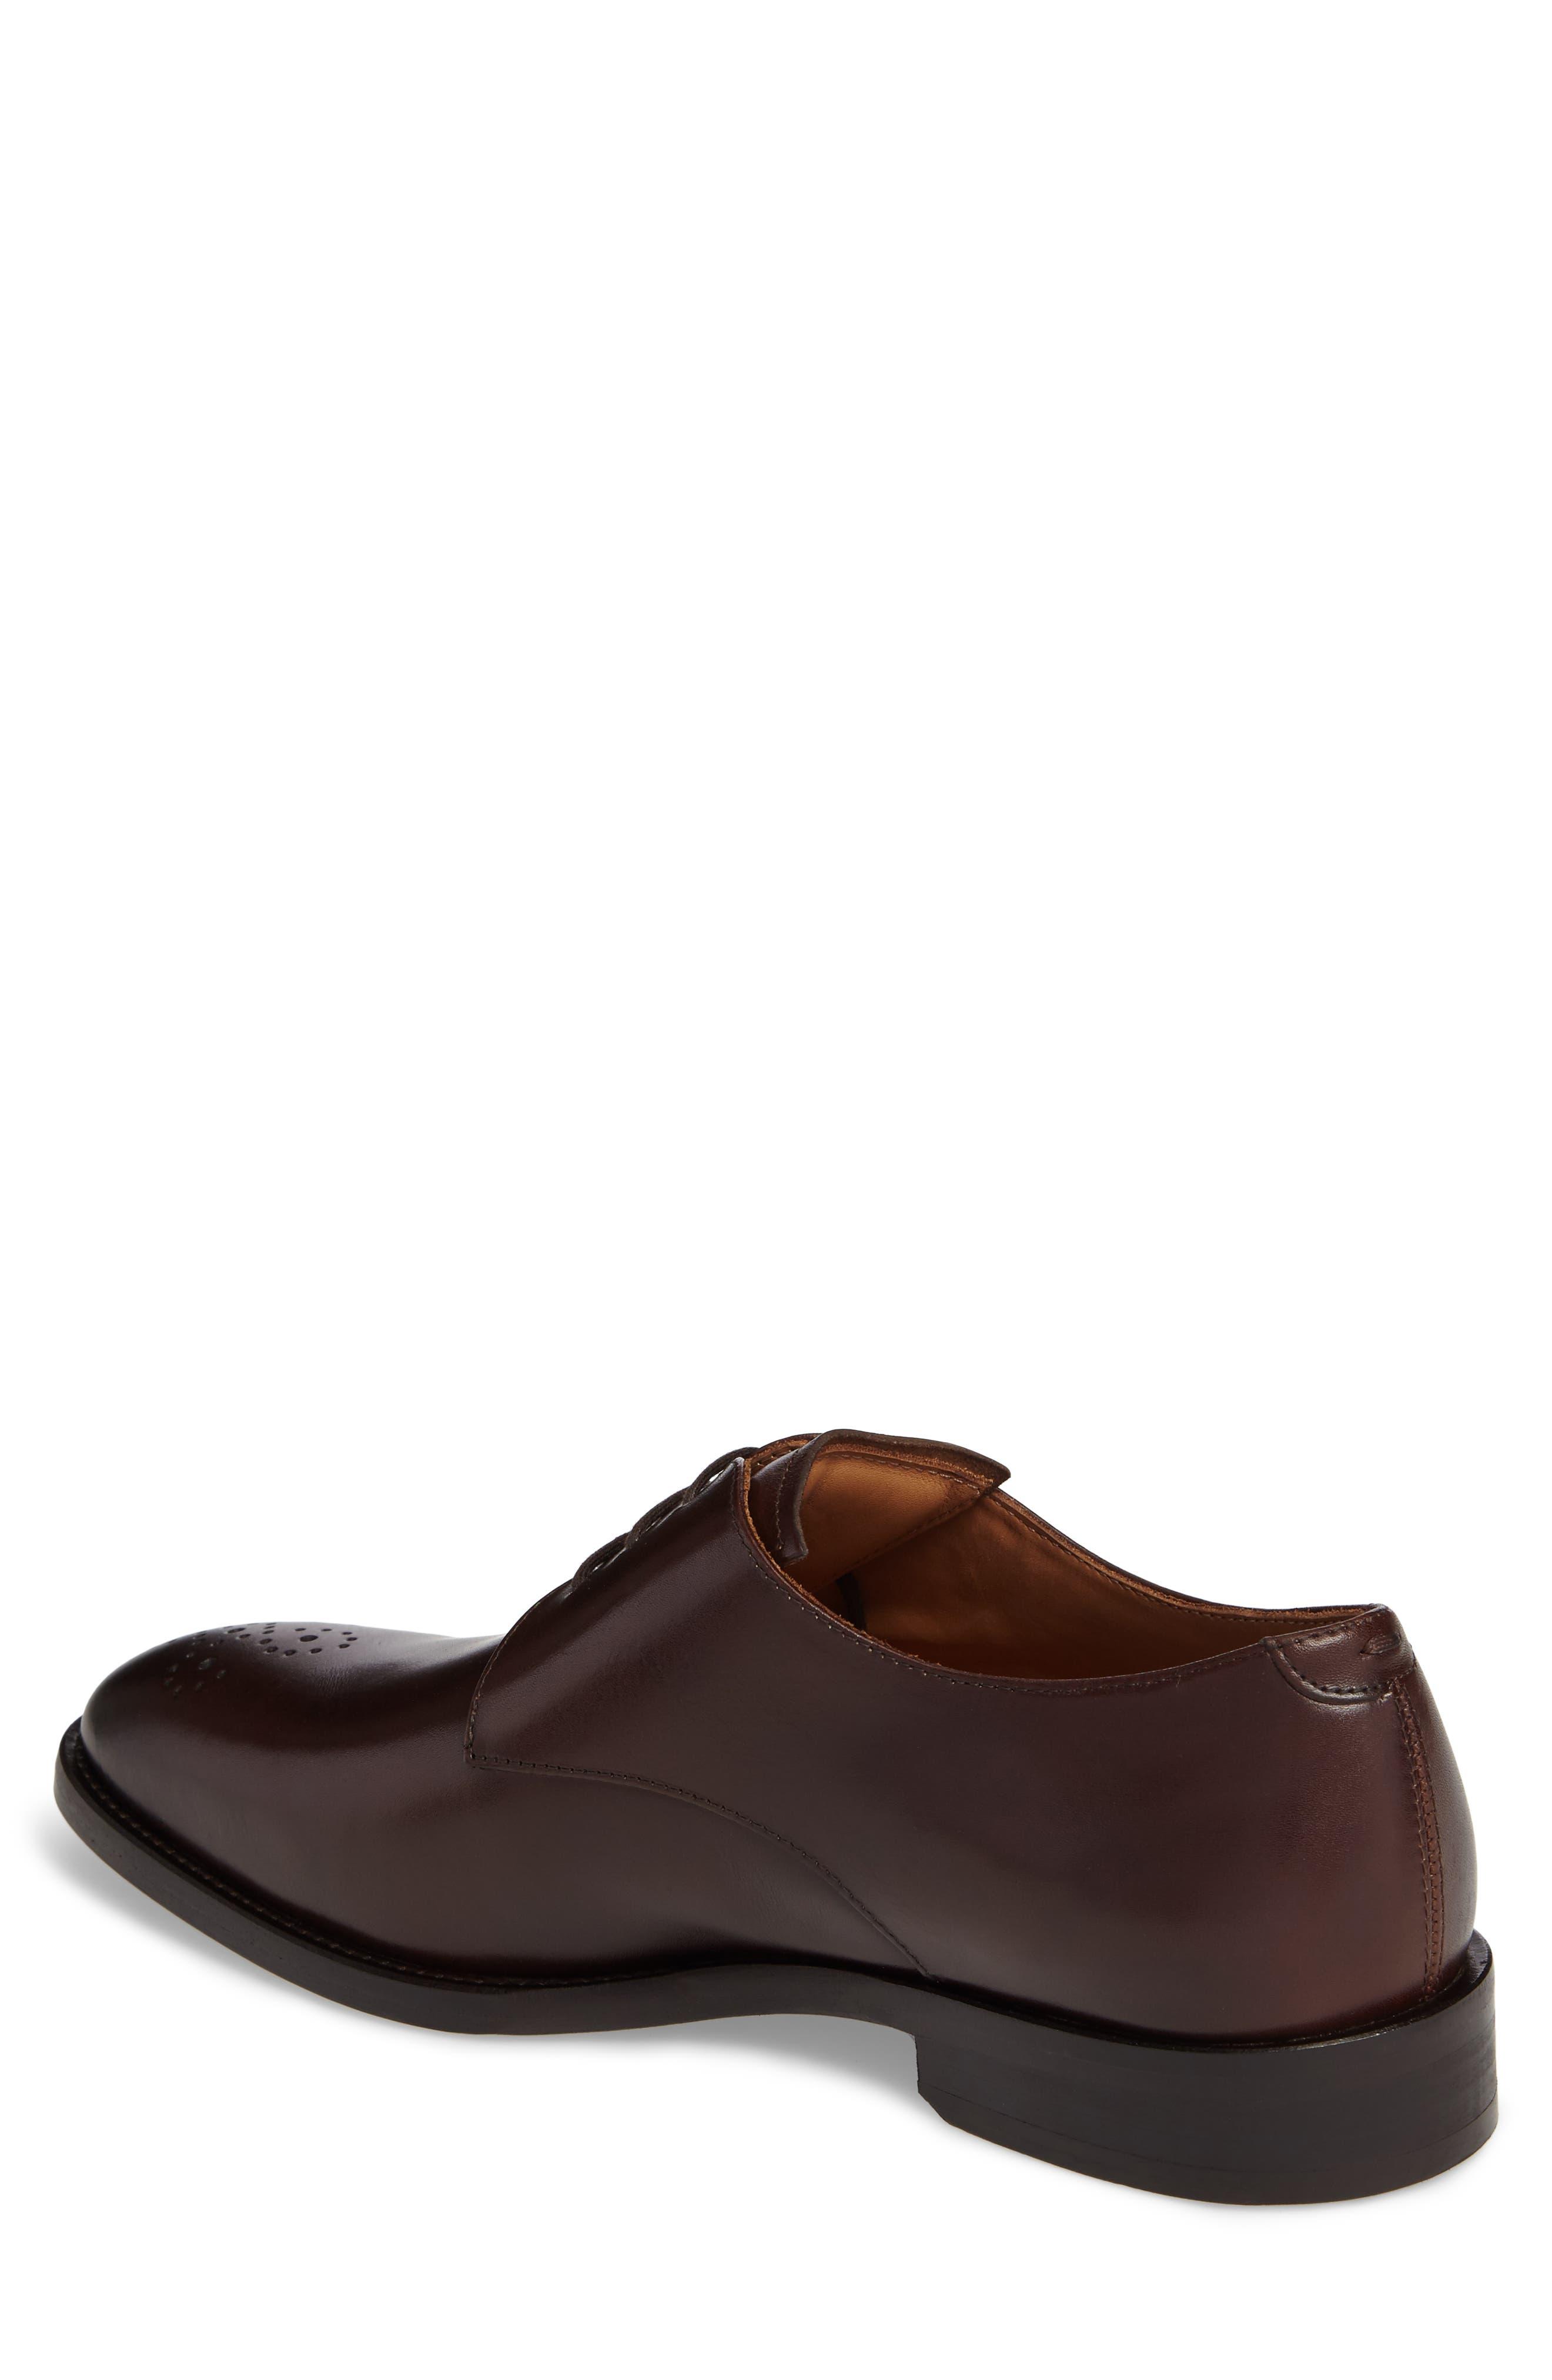 Haltter Medallion Toe Derby,                             Alternate thumbnail 2, color,                             Dark Brown Leather